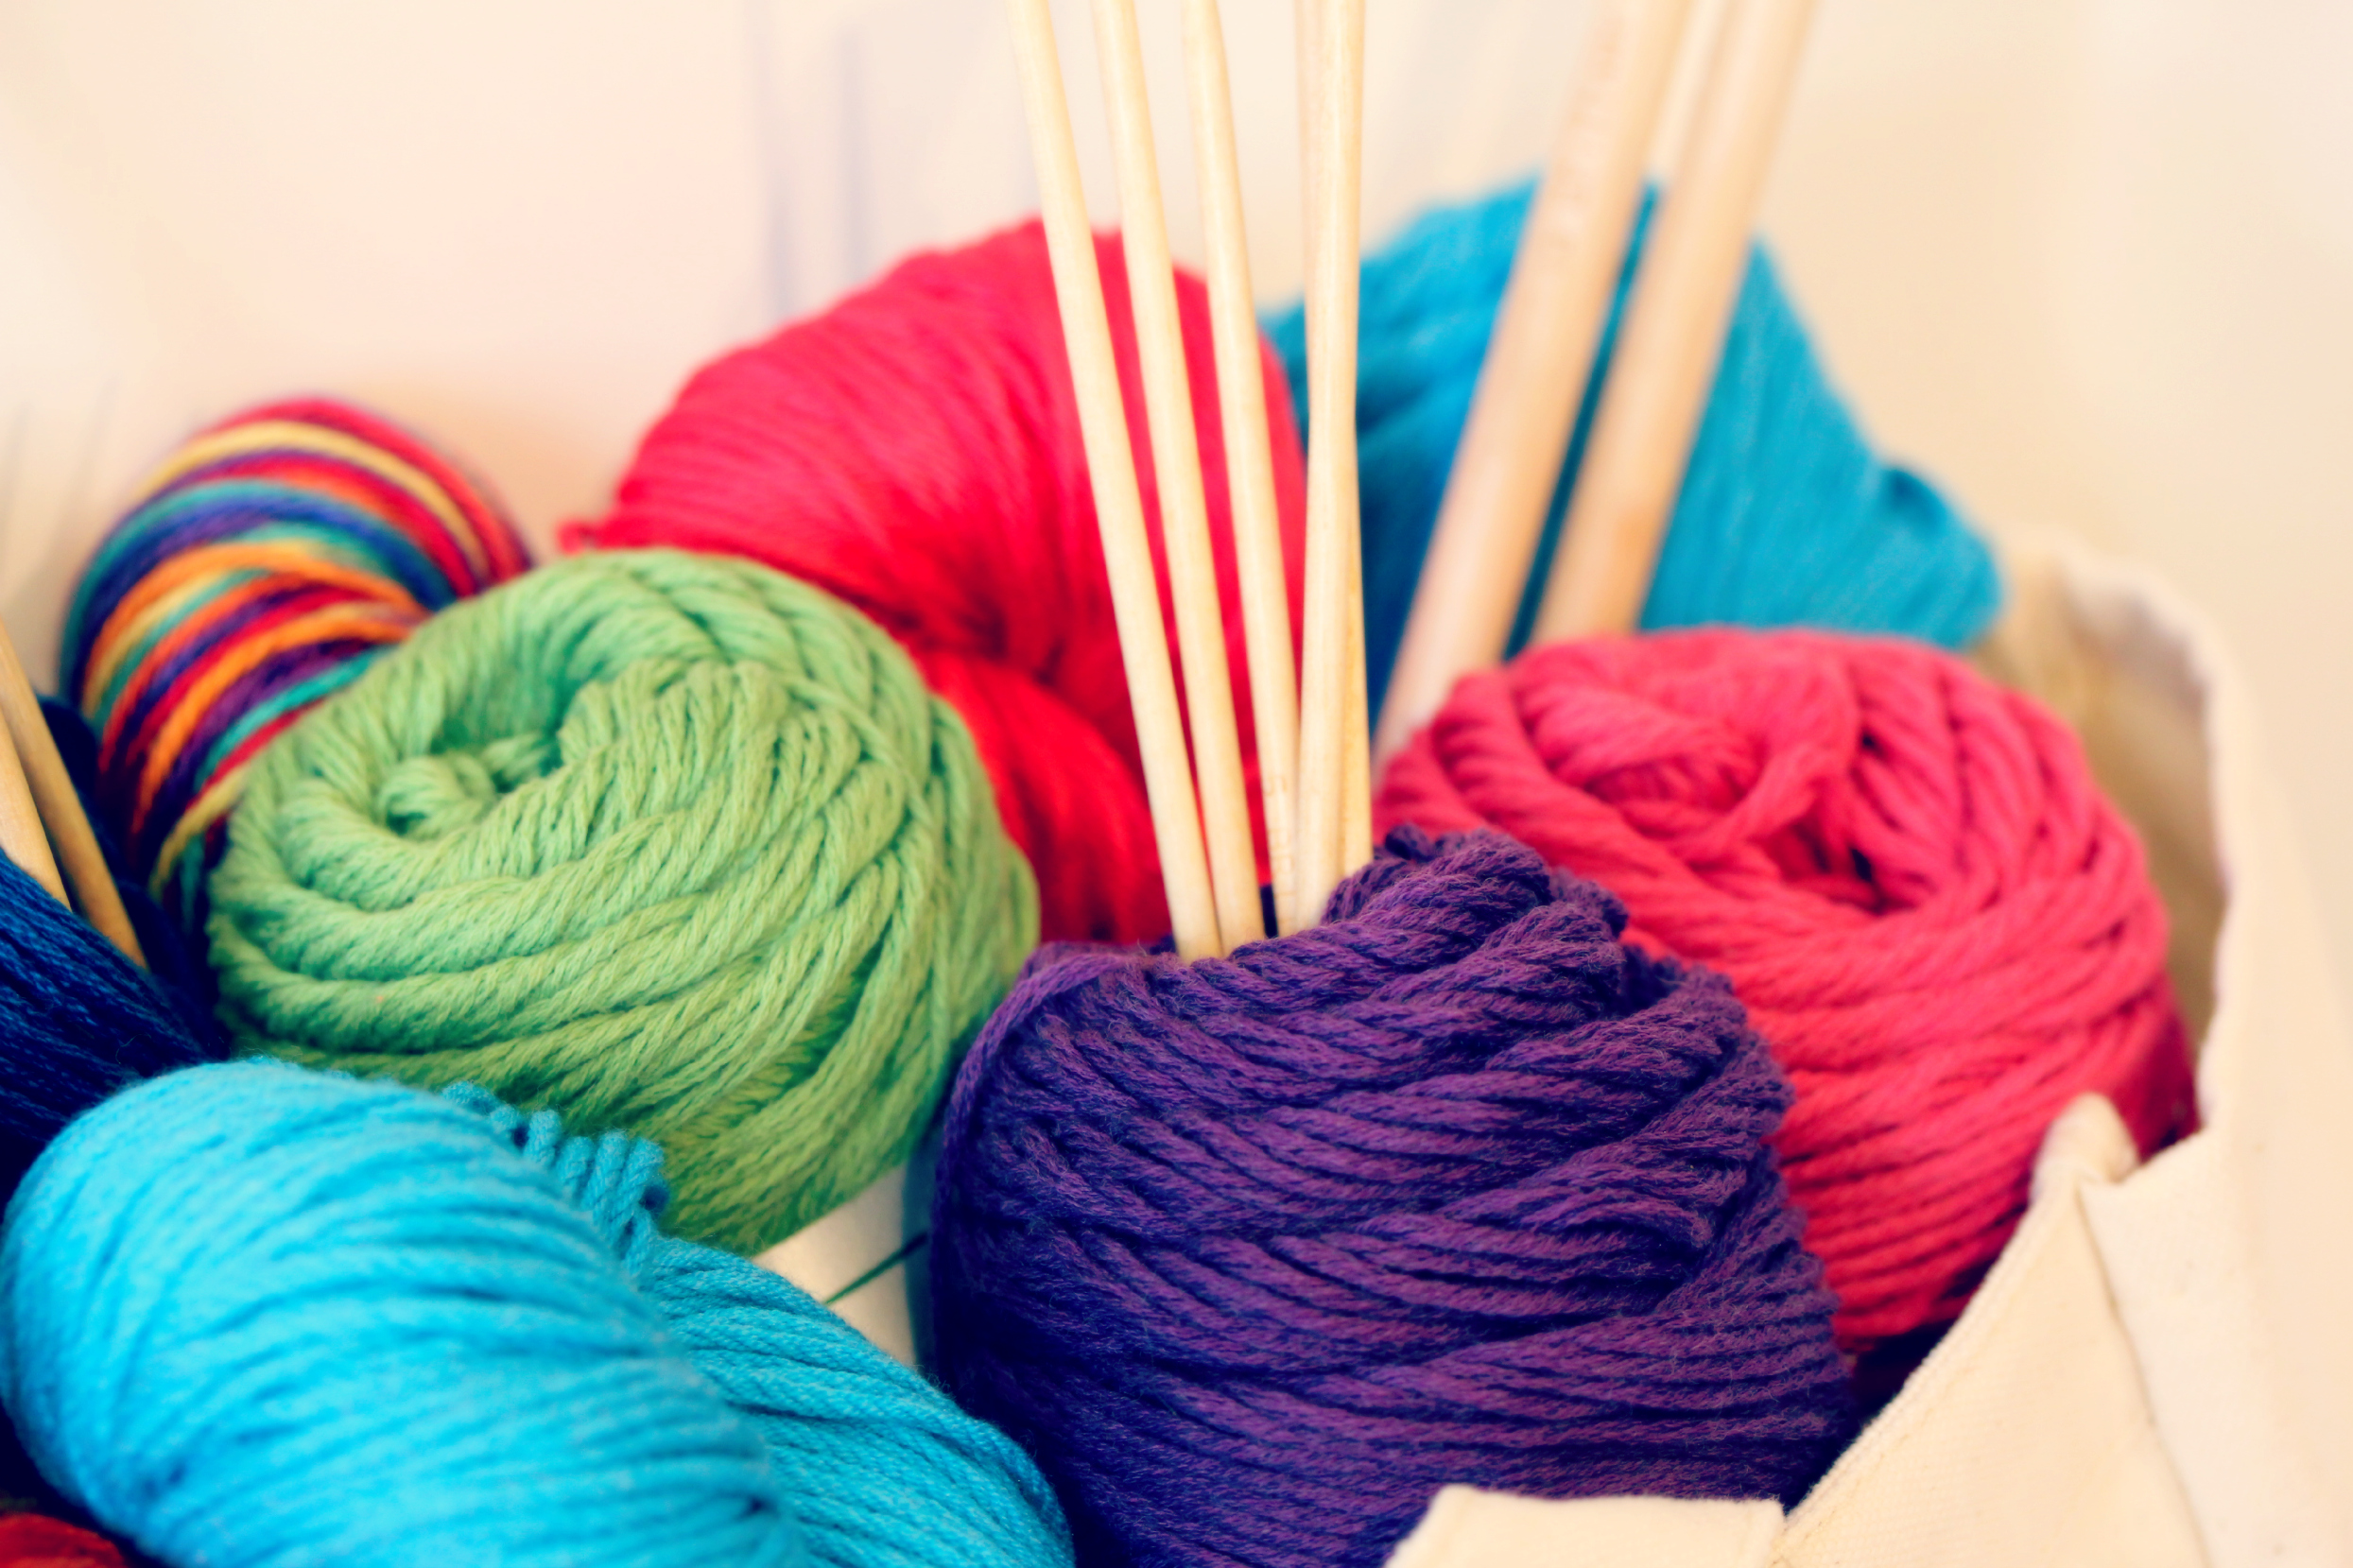 colored-yarns-and-needles-whippletree-yarn-shop Вязание спицами для начинающих: фото, видео, схемы